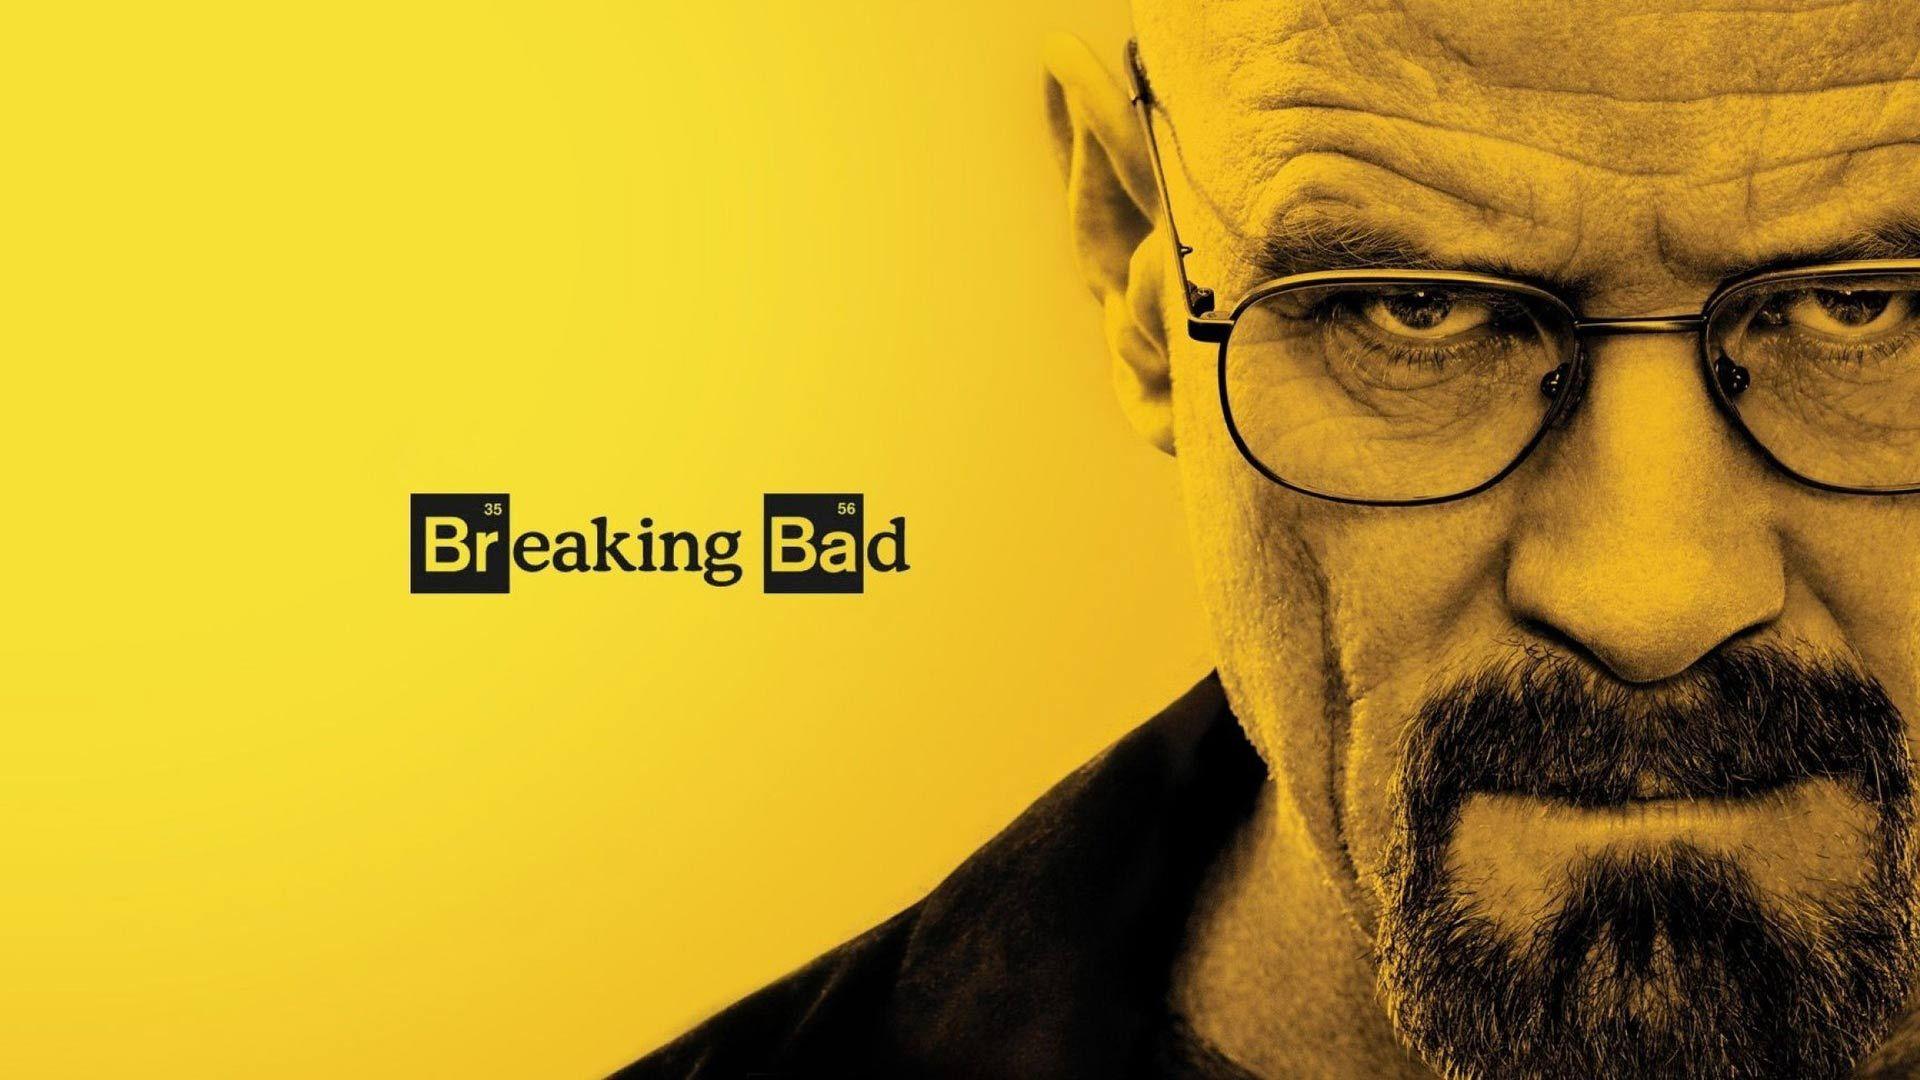 Walter White Breaking Bad Movie Wallpaper Breaking Bad Breaking Bad Seasons Walter White